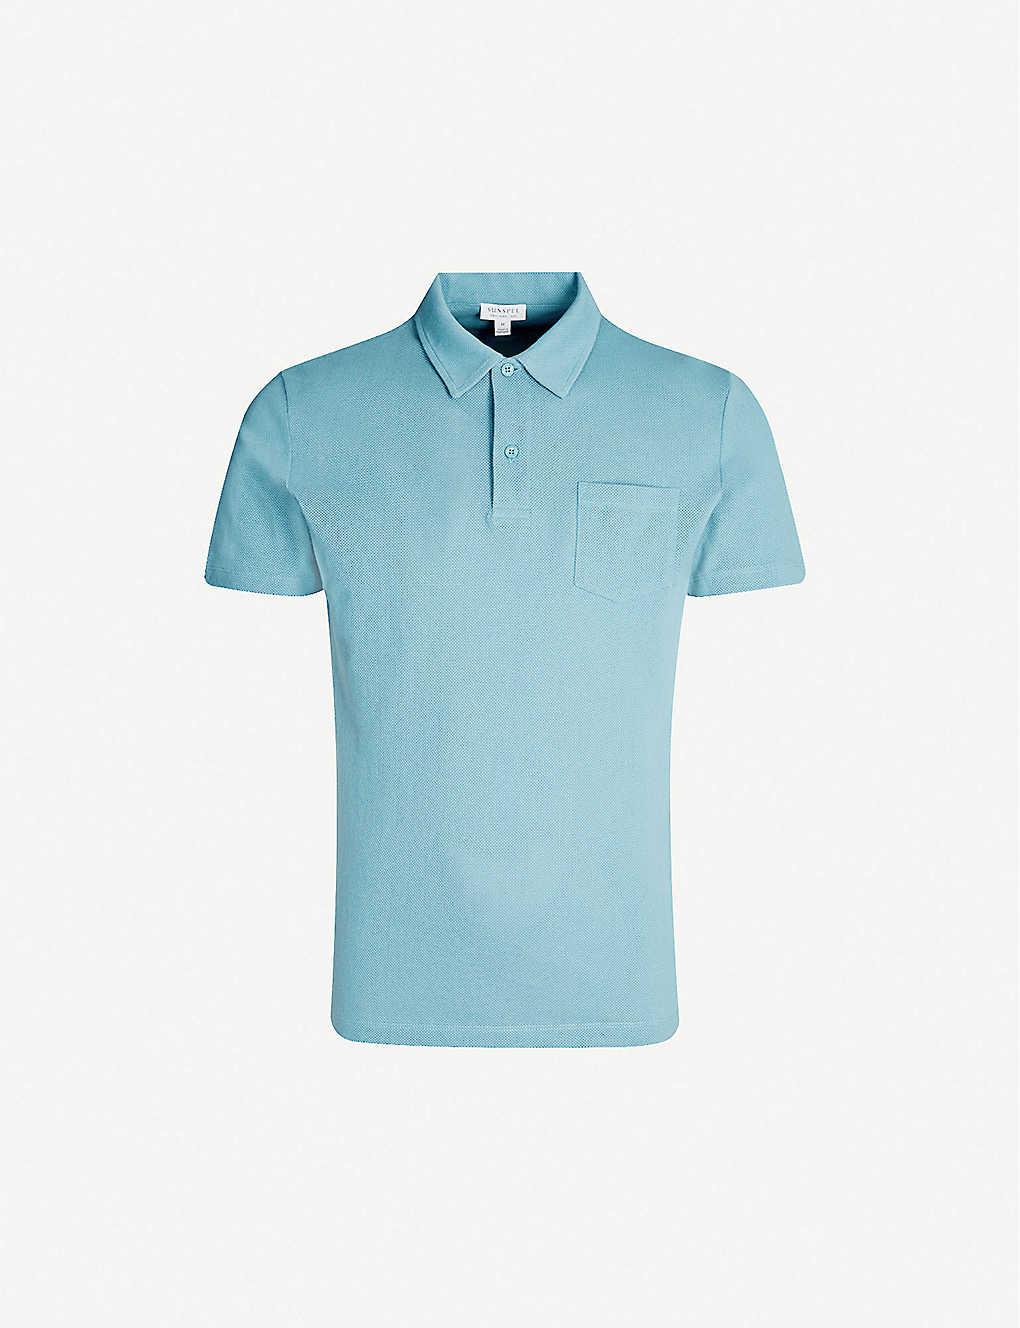 e67868c4 SUNSPEL - Riviera cotton-mesh polo shirt | Selfridges.com